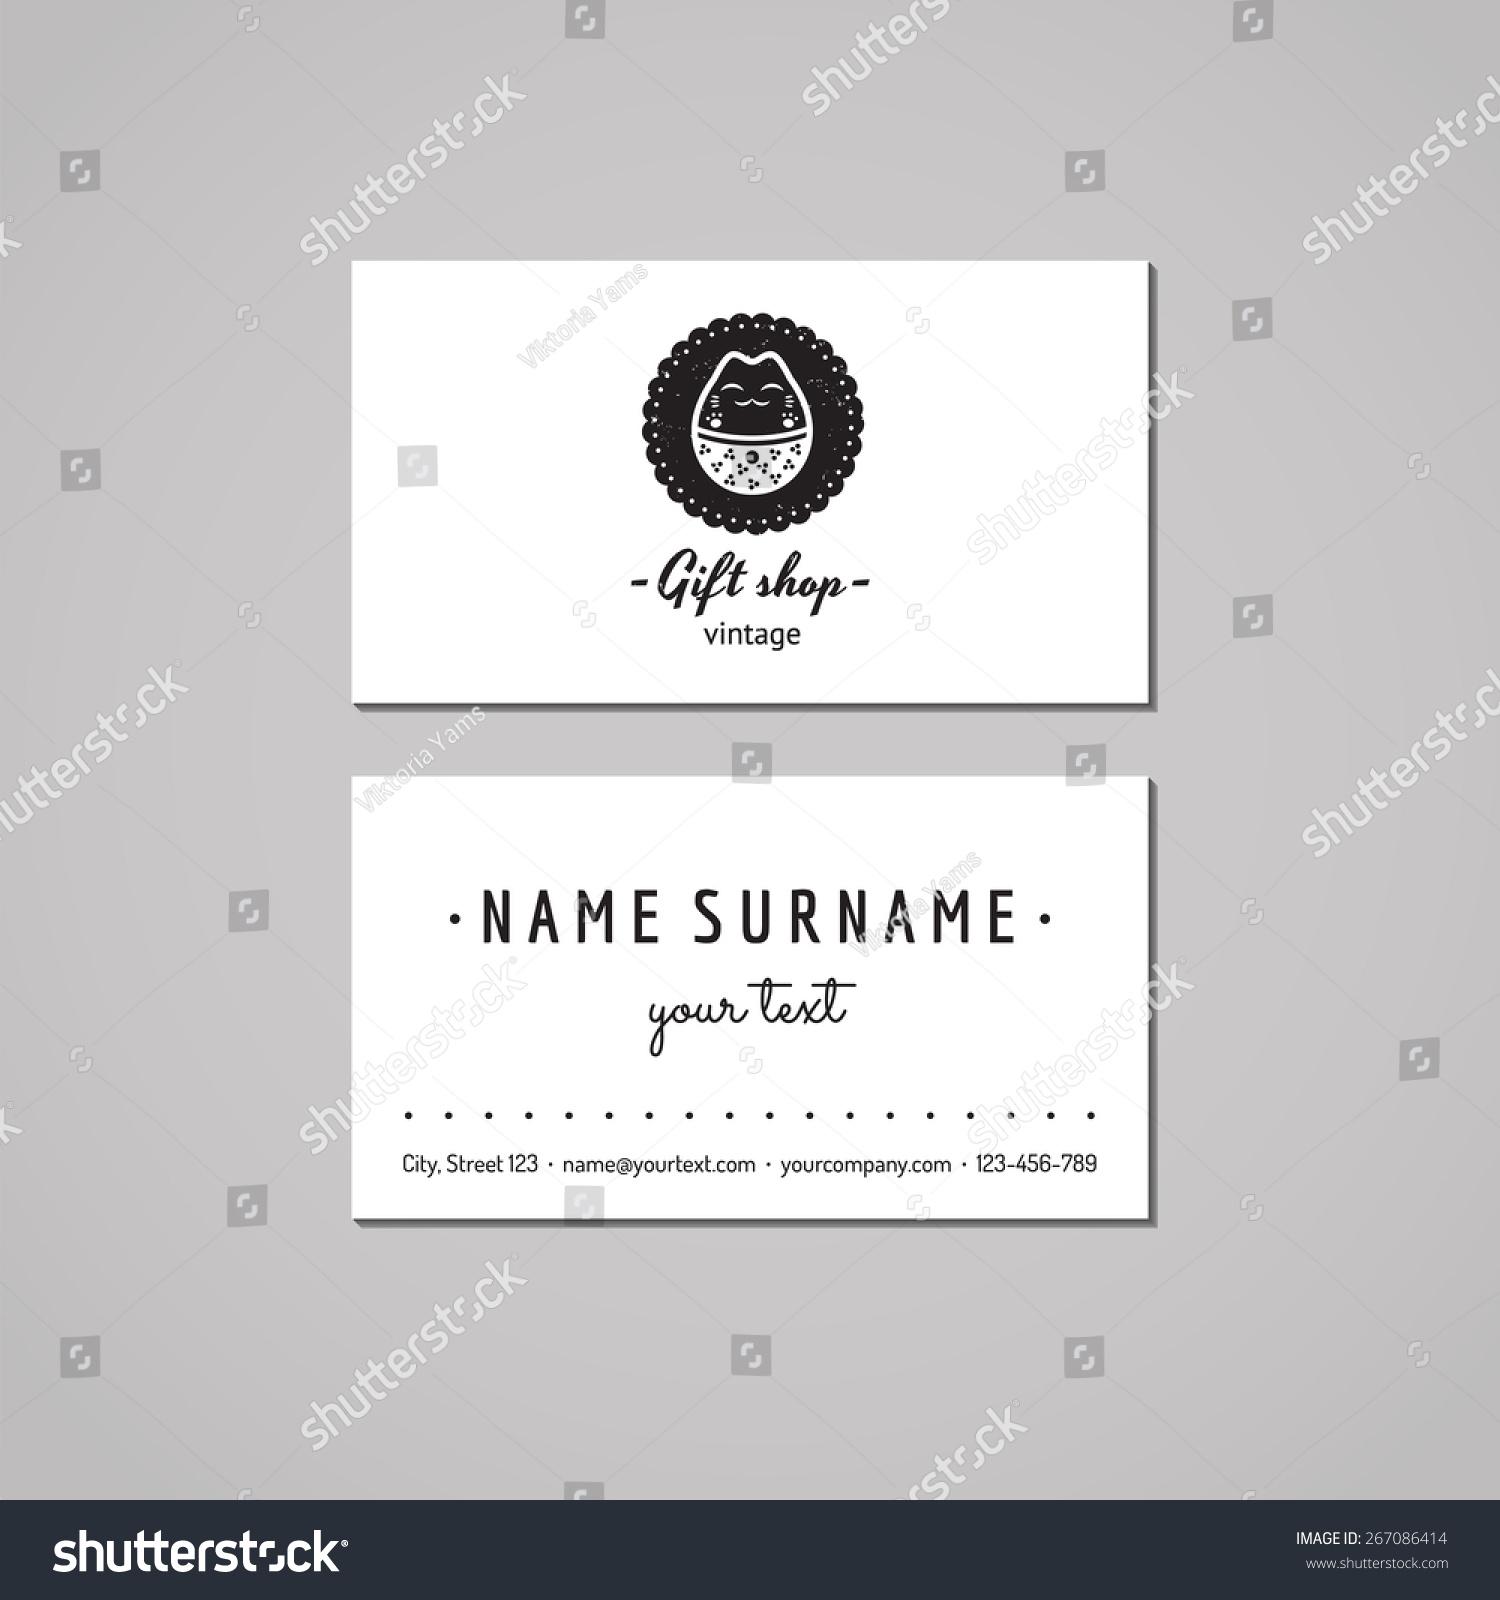 Gift Shop Souvenirs Business Card Design Stock Vector 267086414 ...